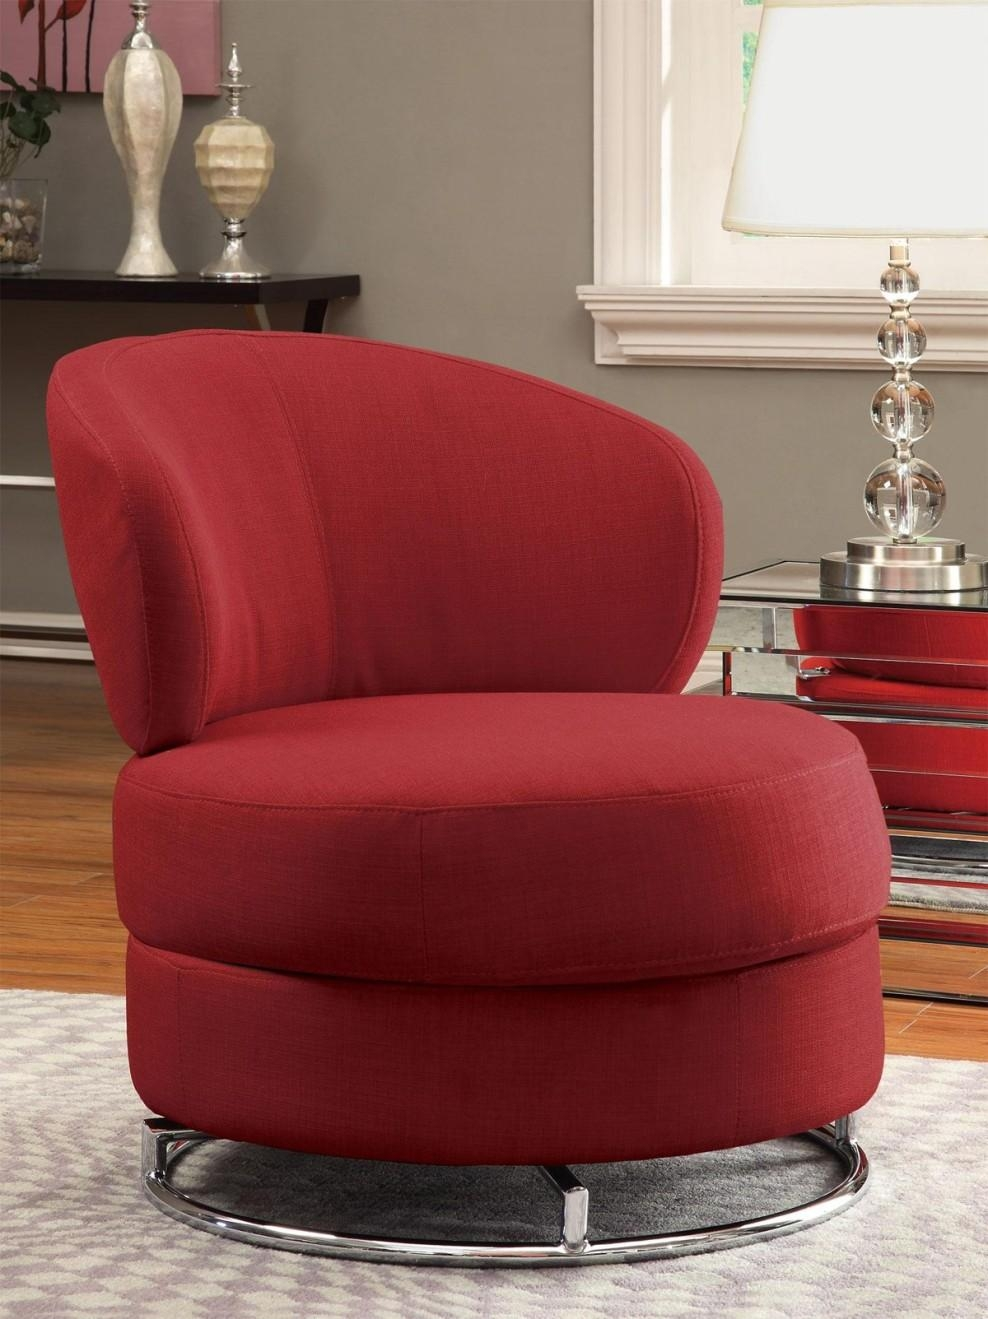 Round Sofa Chair Living Room Furniture | Vivo Furniture Inside Round Sofa Chairs (Image 9 of 20)